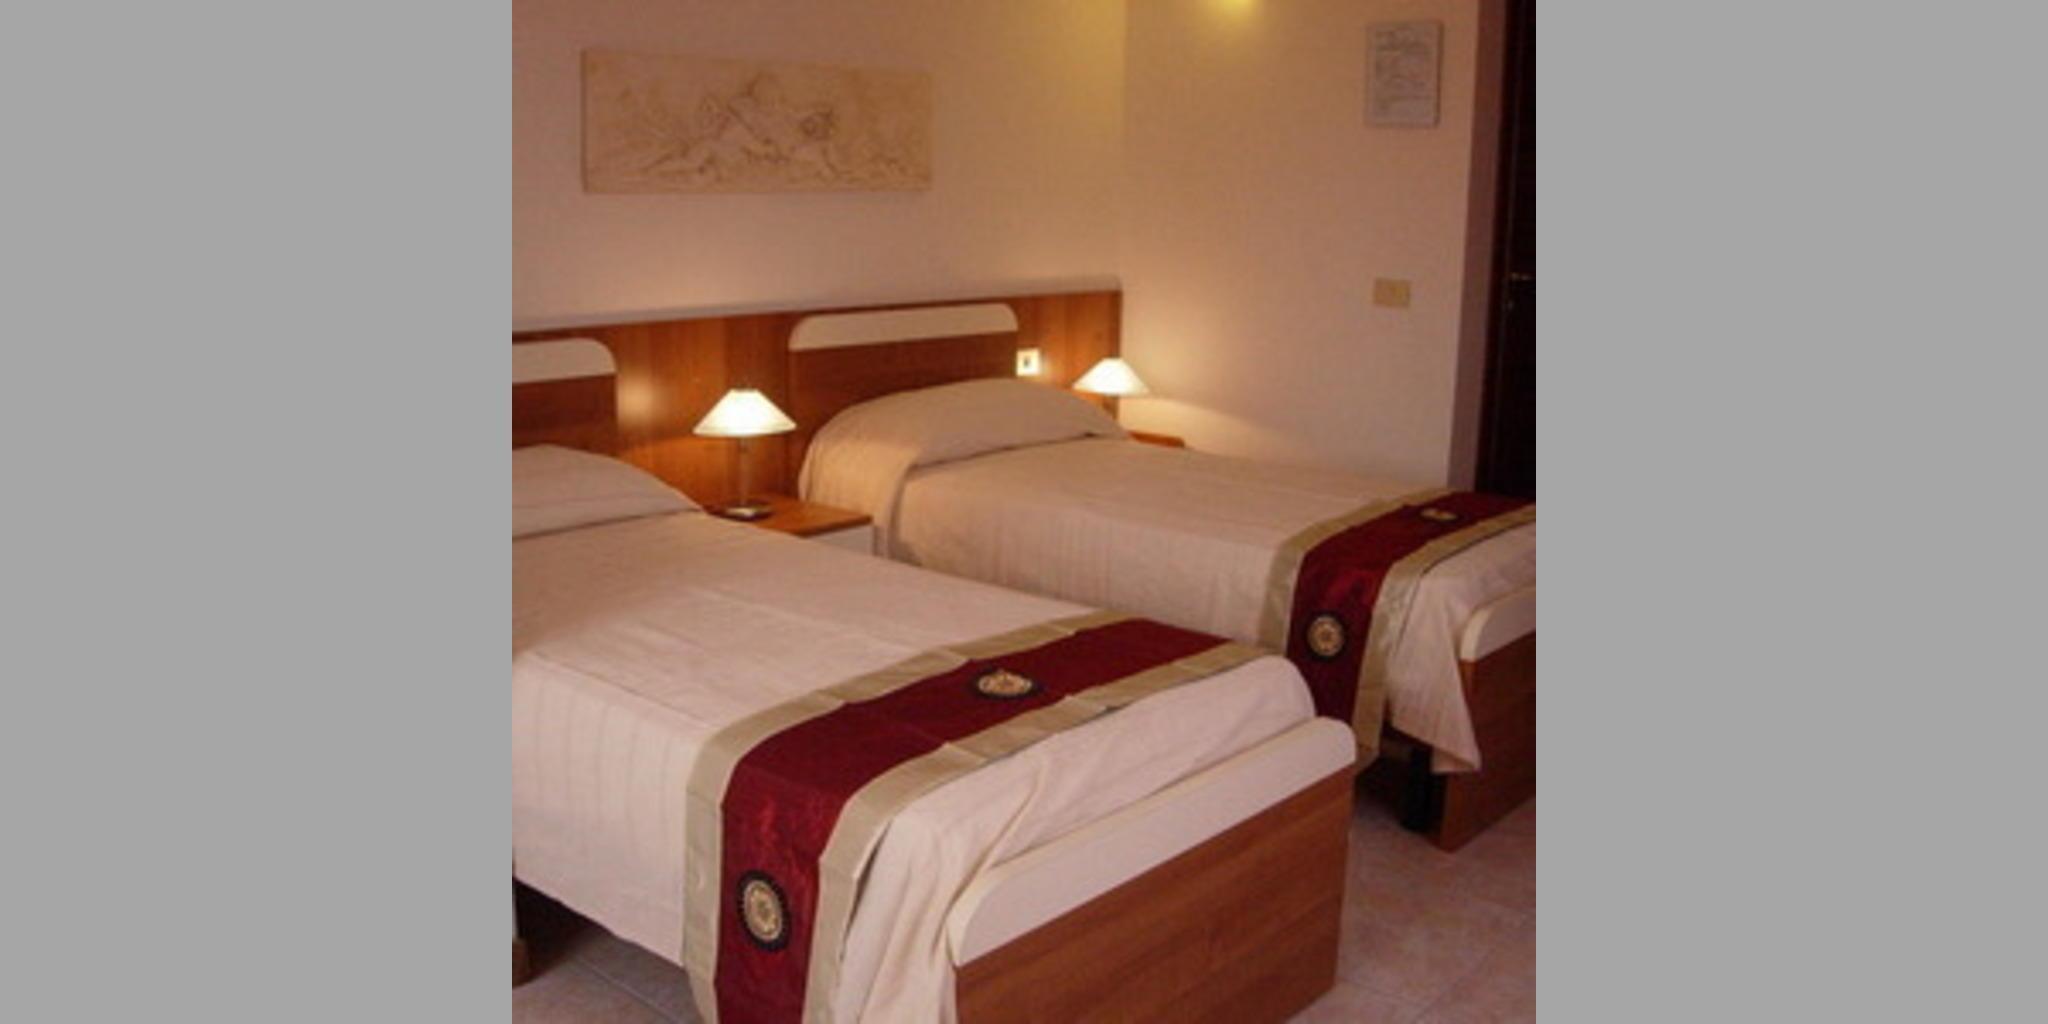 Guest House Roverbella - Roverbella